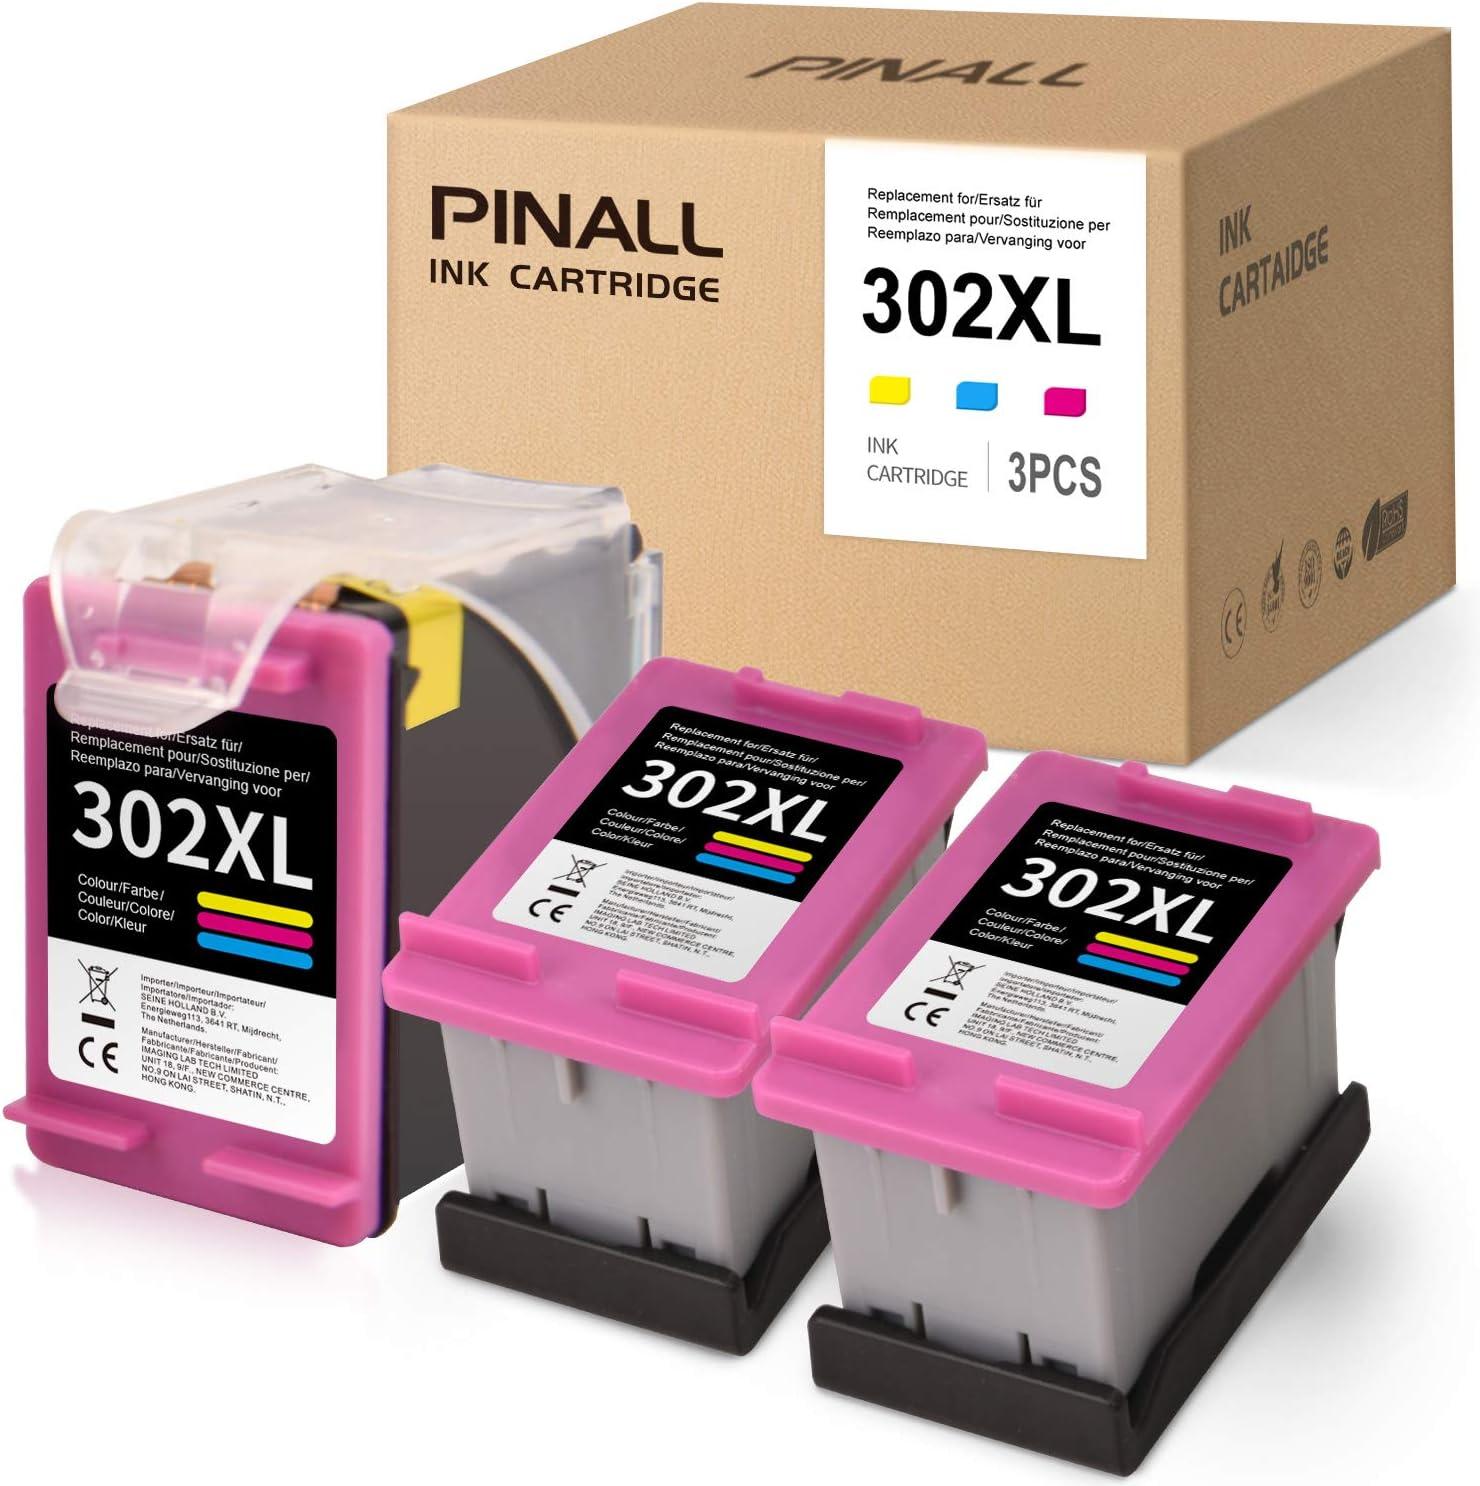 PINALL Remanufacturado Cartuchos de Tinta Reemplazo para HP 302 XL 302XL Compatible con HP Envy 4520 4527 4524 DeskJet 1110 3630 2130 2132 3637 3636 3638 OfficeJet 4652 3830 3831 3833 (3X Color: Amazon.es: Electrónica